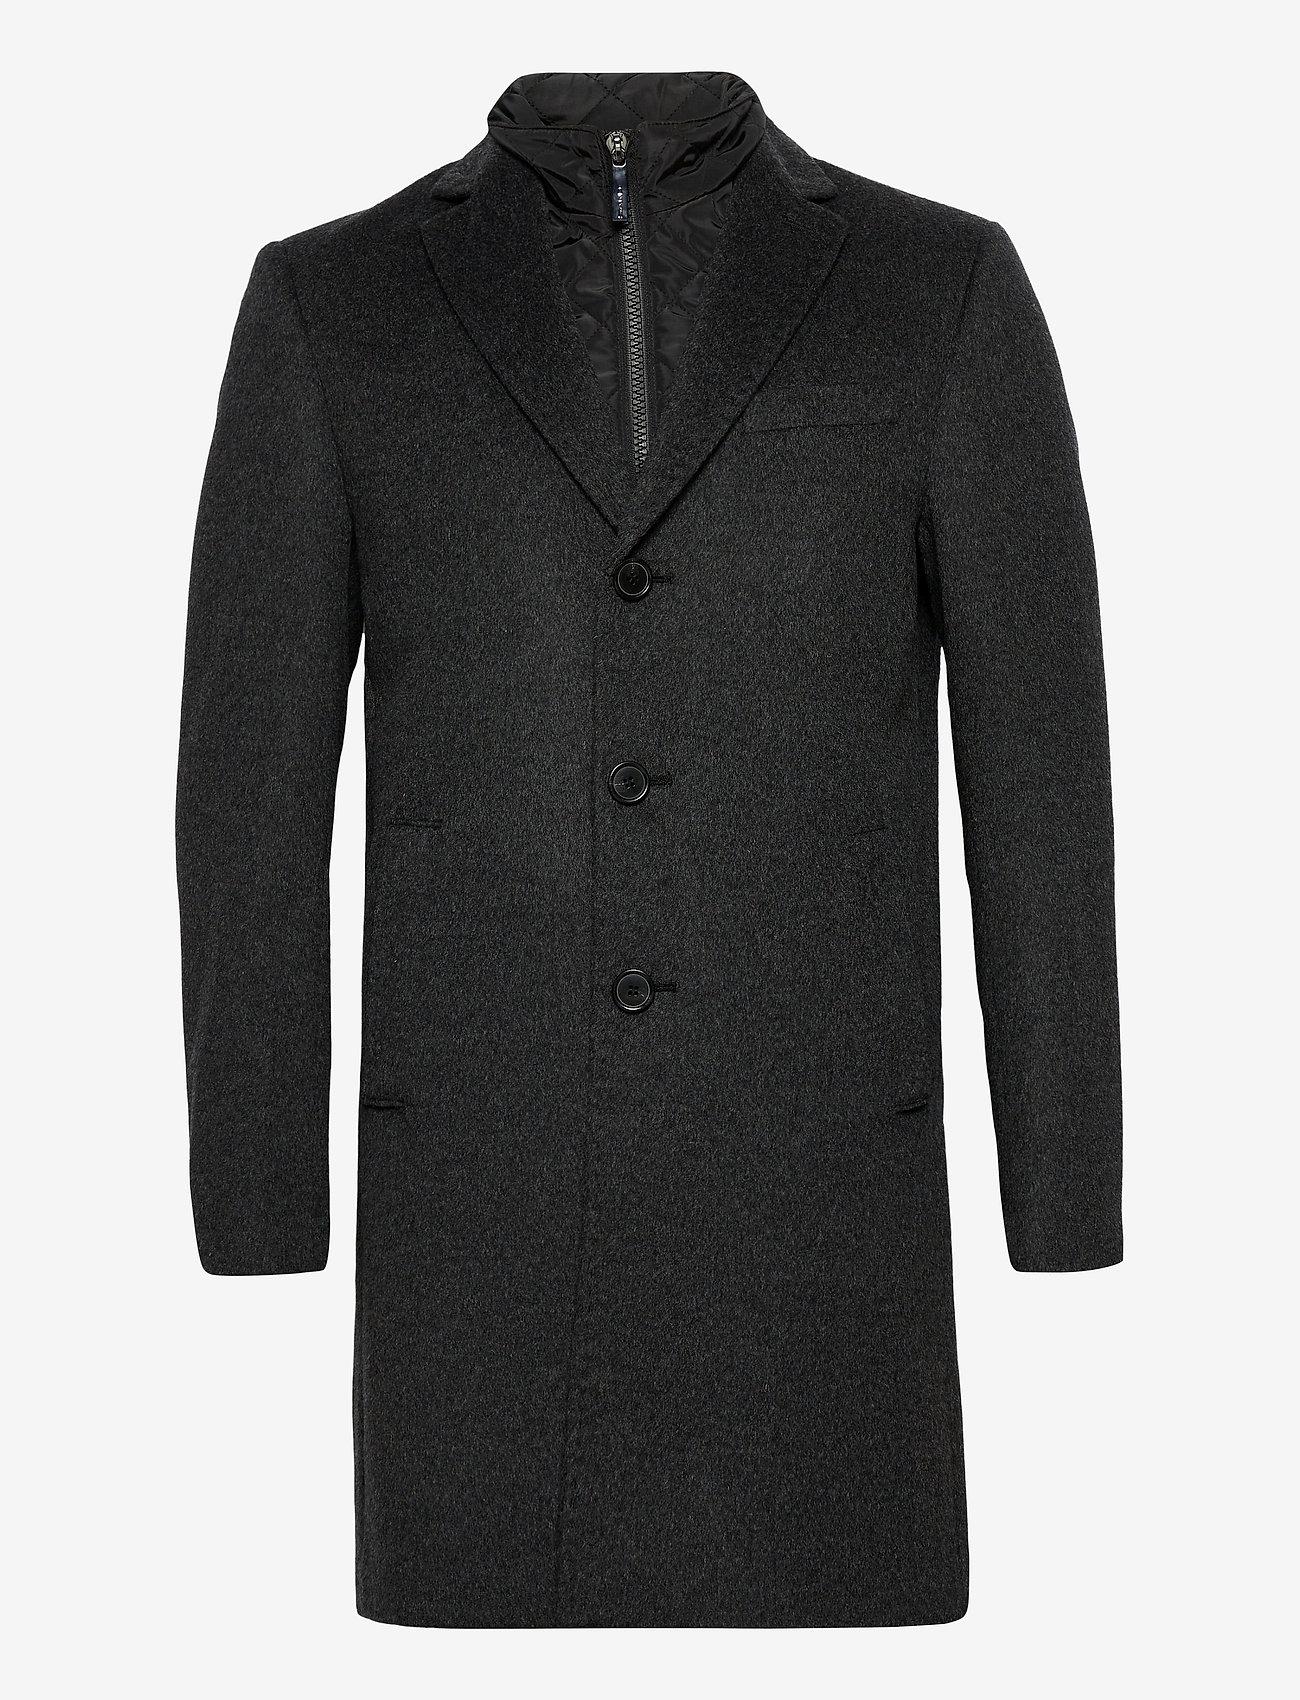 SAND - Cashmere Coat - Sultan Tech - ullrockar - charcoal - 1